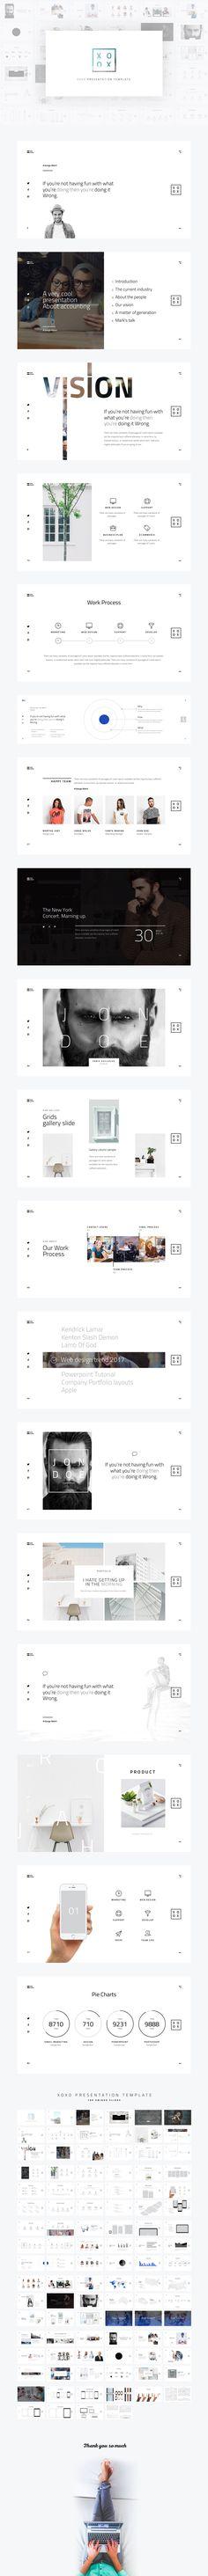 XOXO-Minimal Presentation Template on Behance